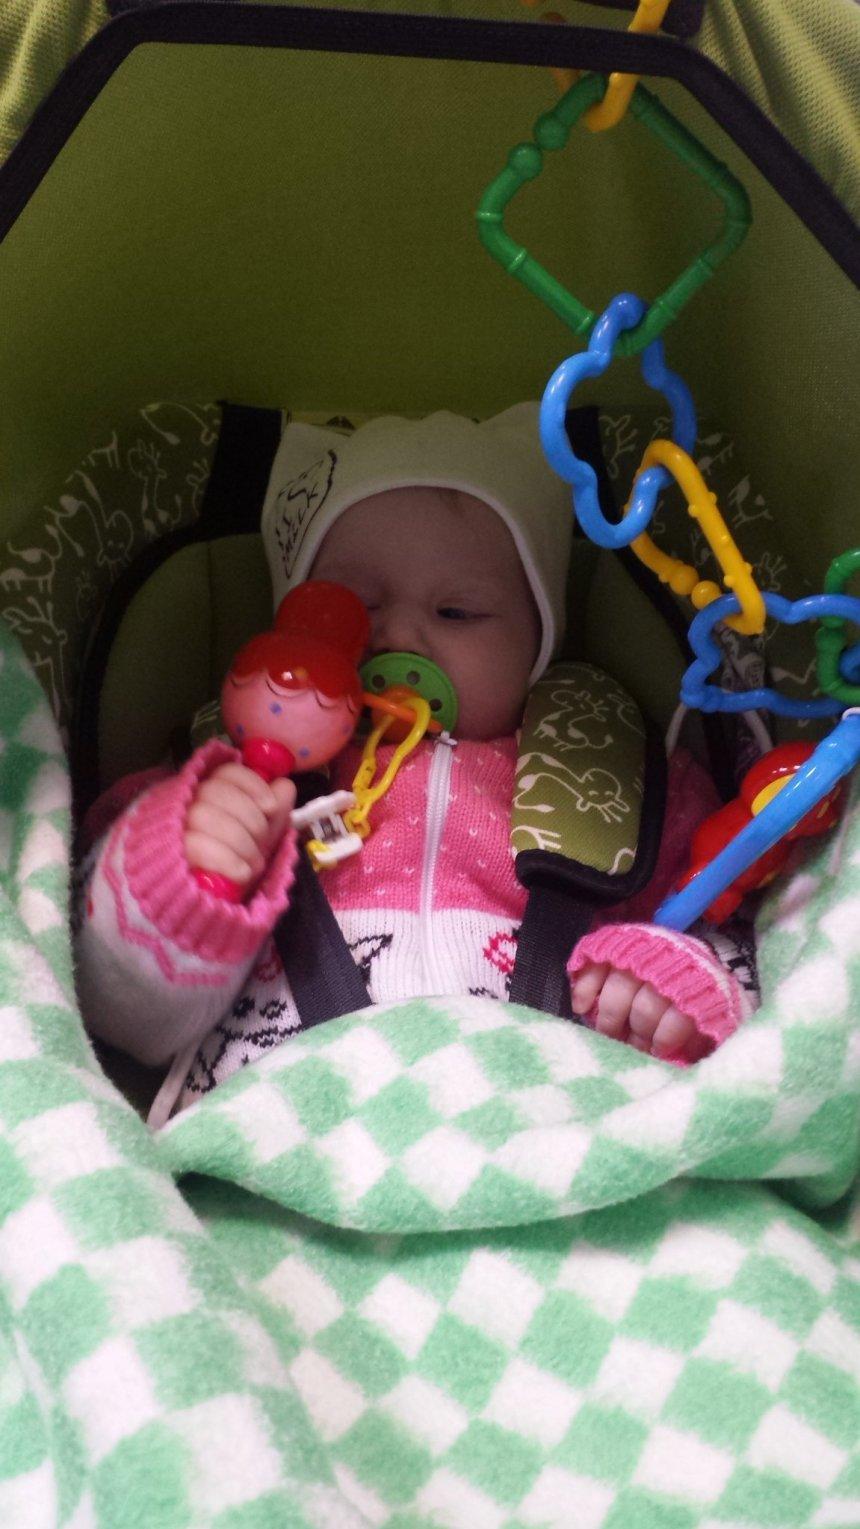 Отчёт по занятию Игры со звучащими игрушками в Wachanga!